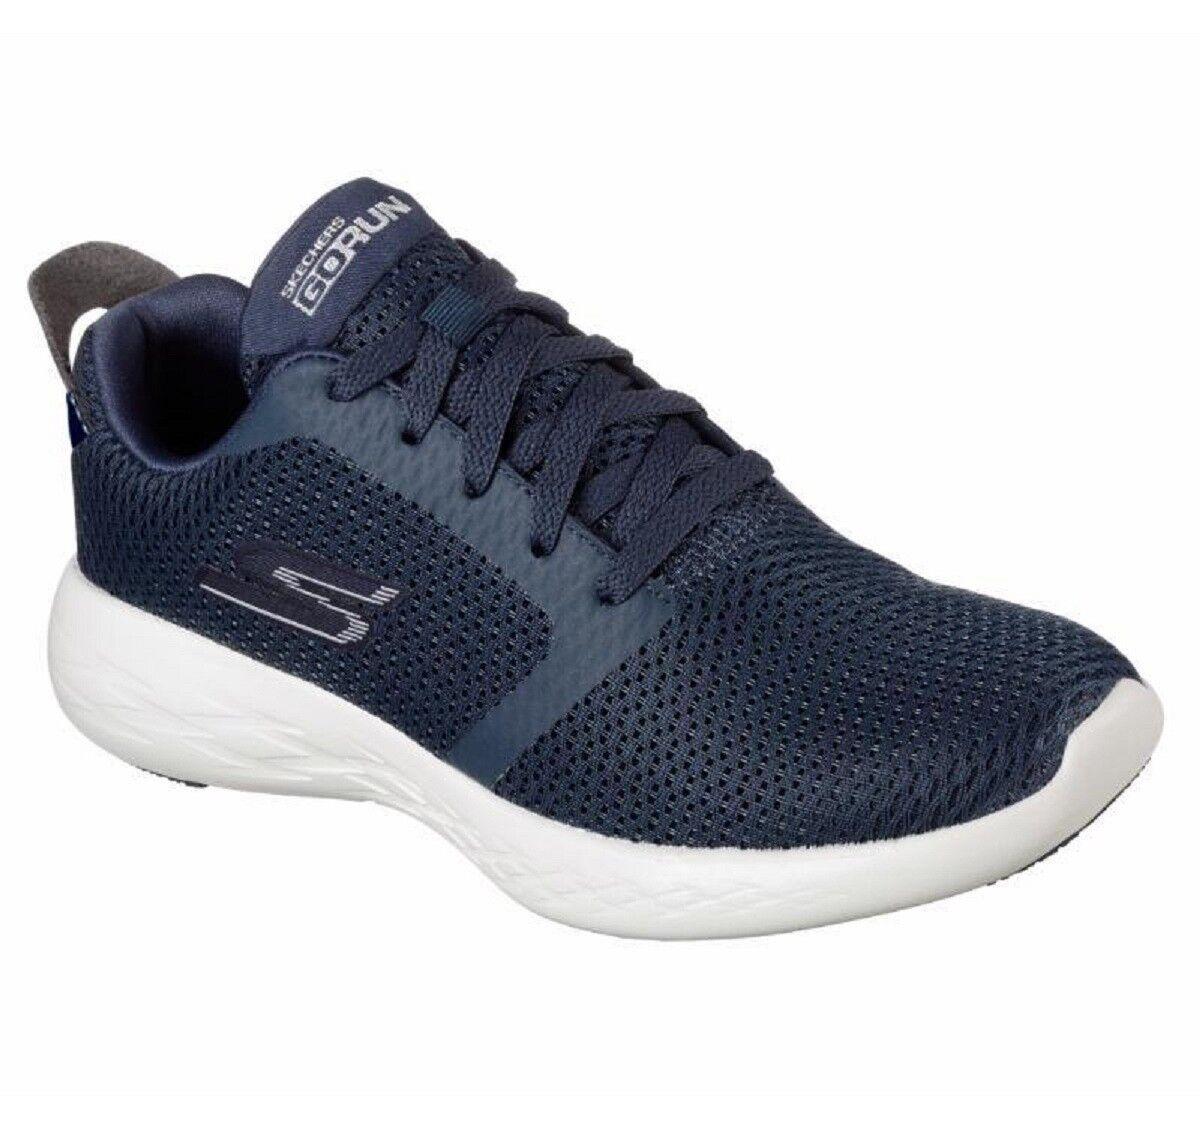 SKECHERS GO RUN 600 REFINE - Navy - casual Sneakers Woman - Scarpe casual - donna - gym 654326